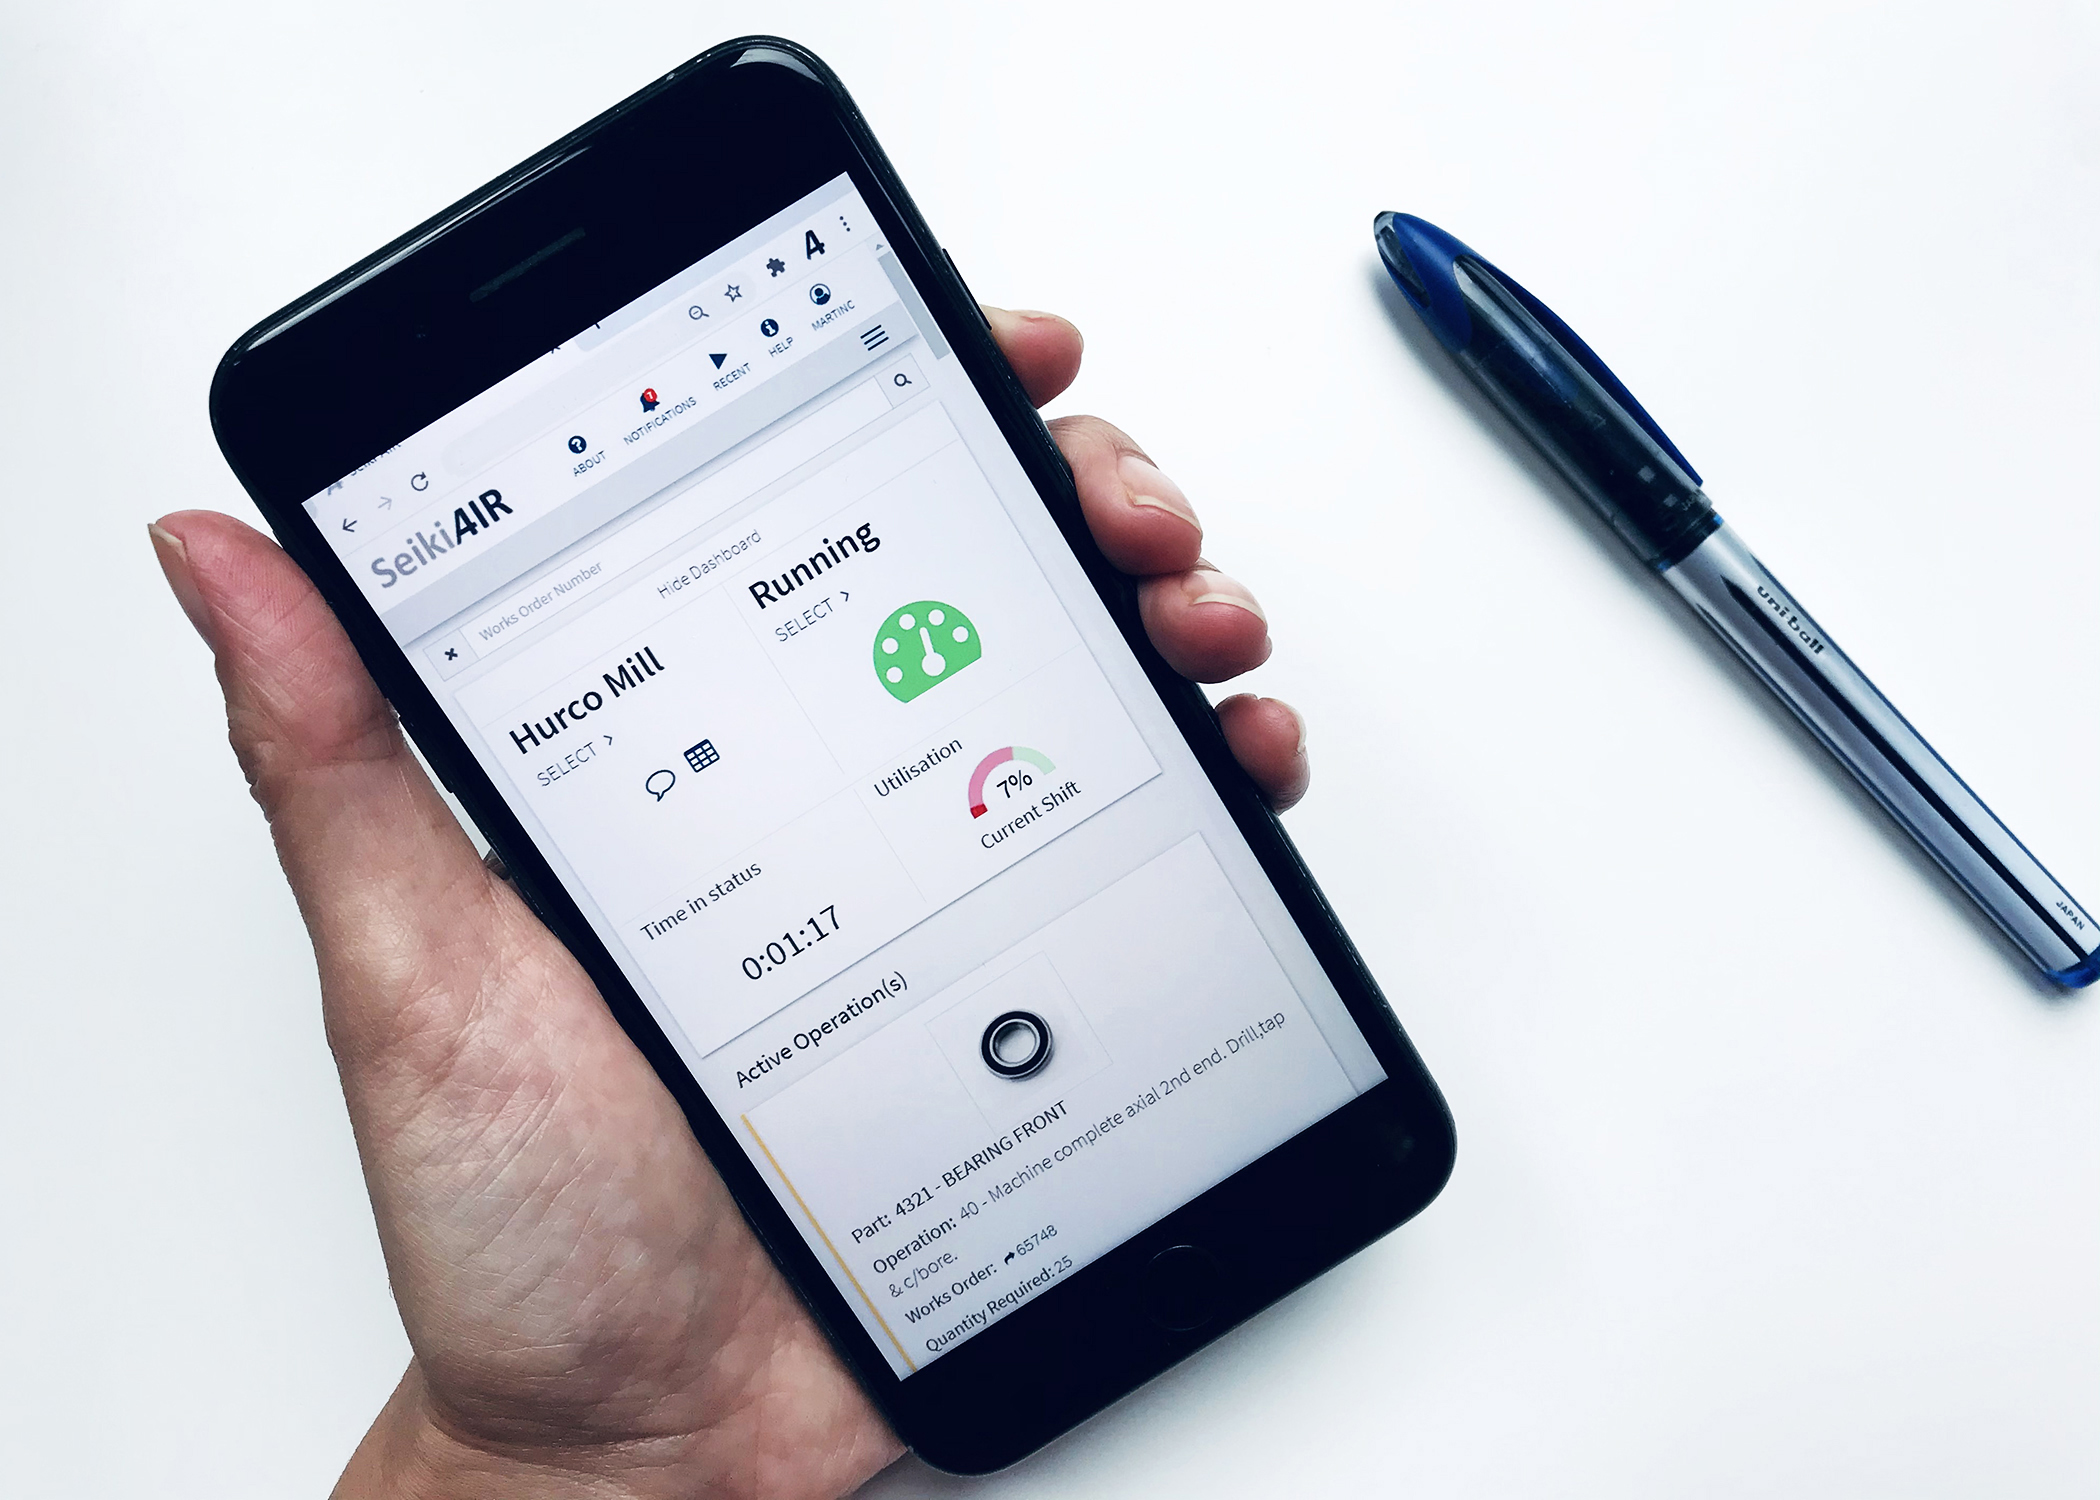 Seiki AIR Smart Factory Solution